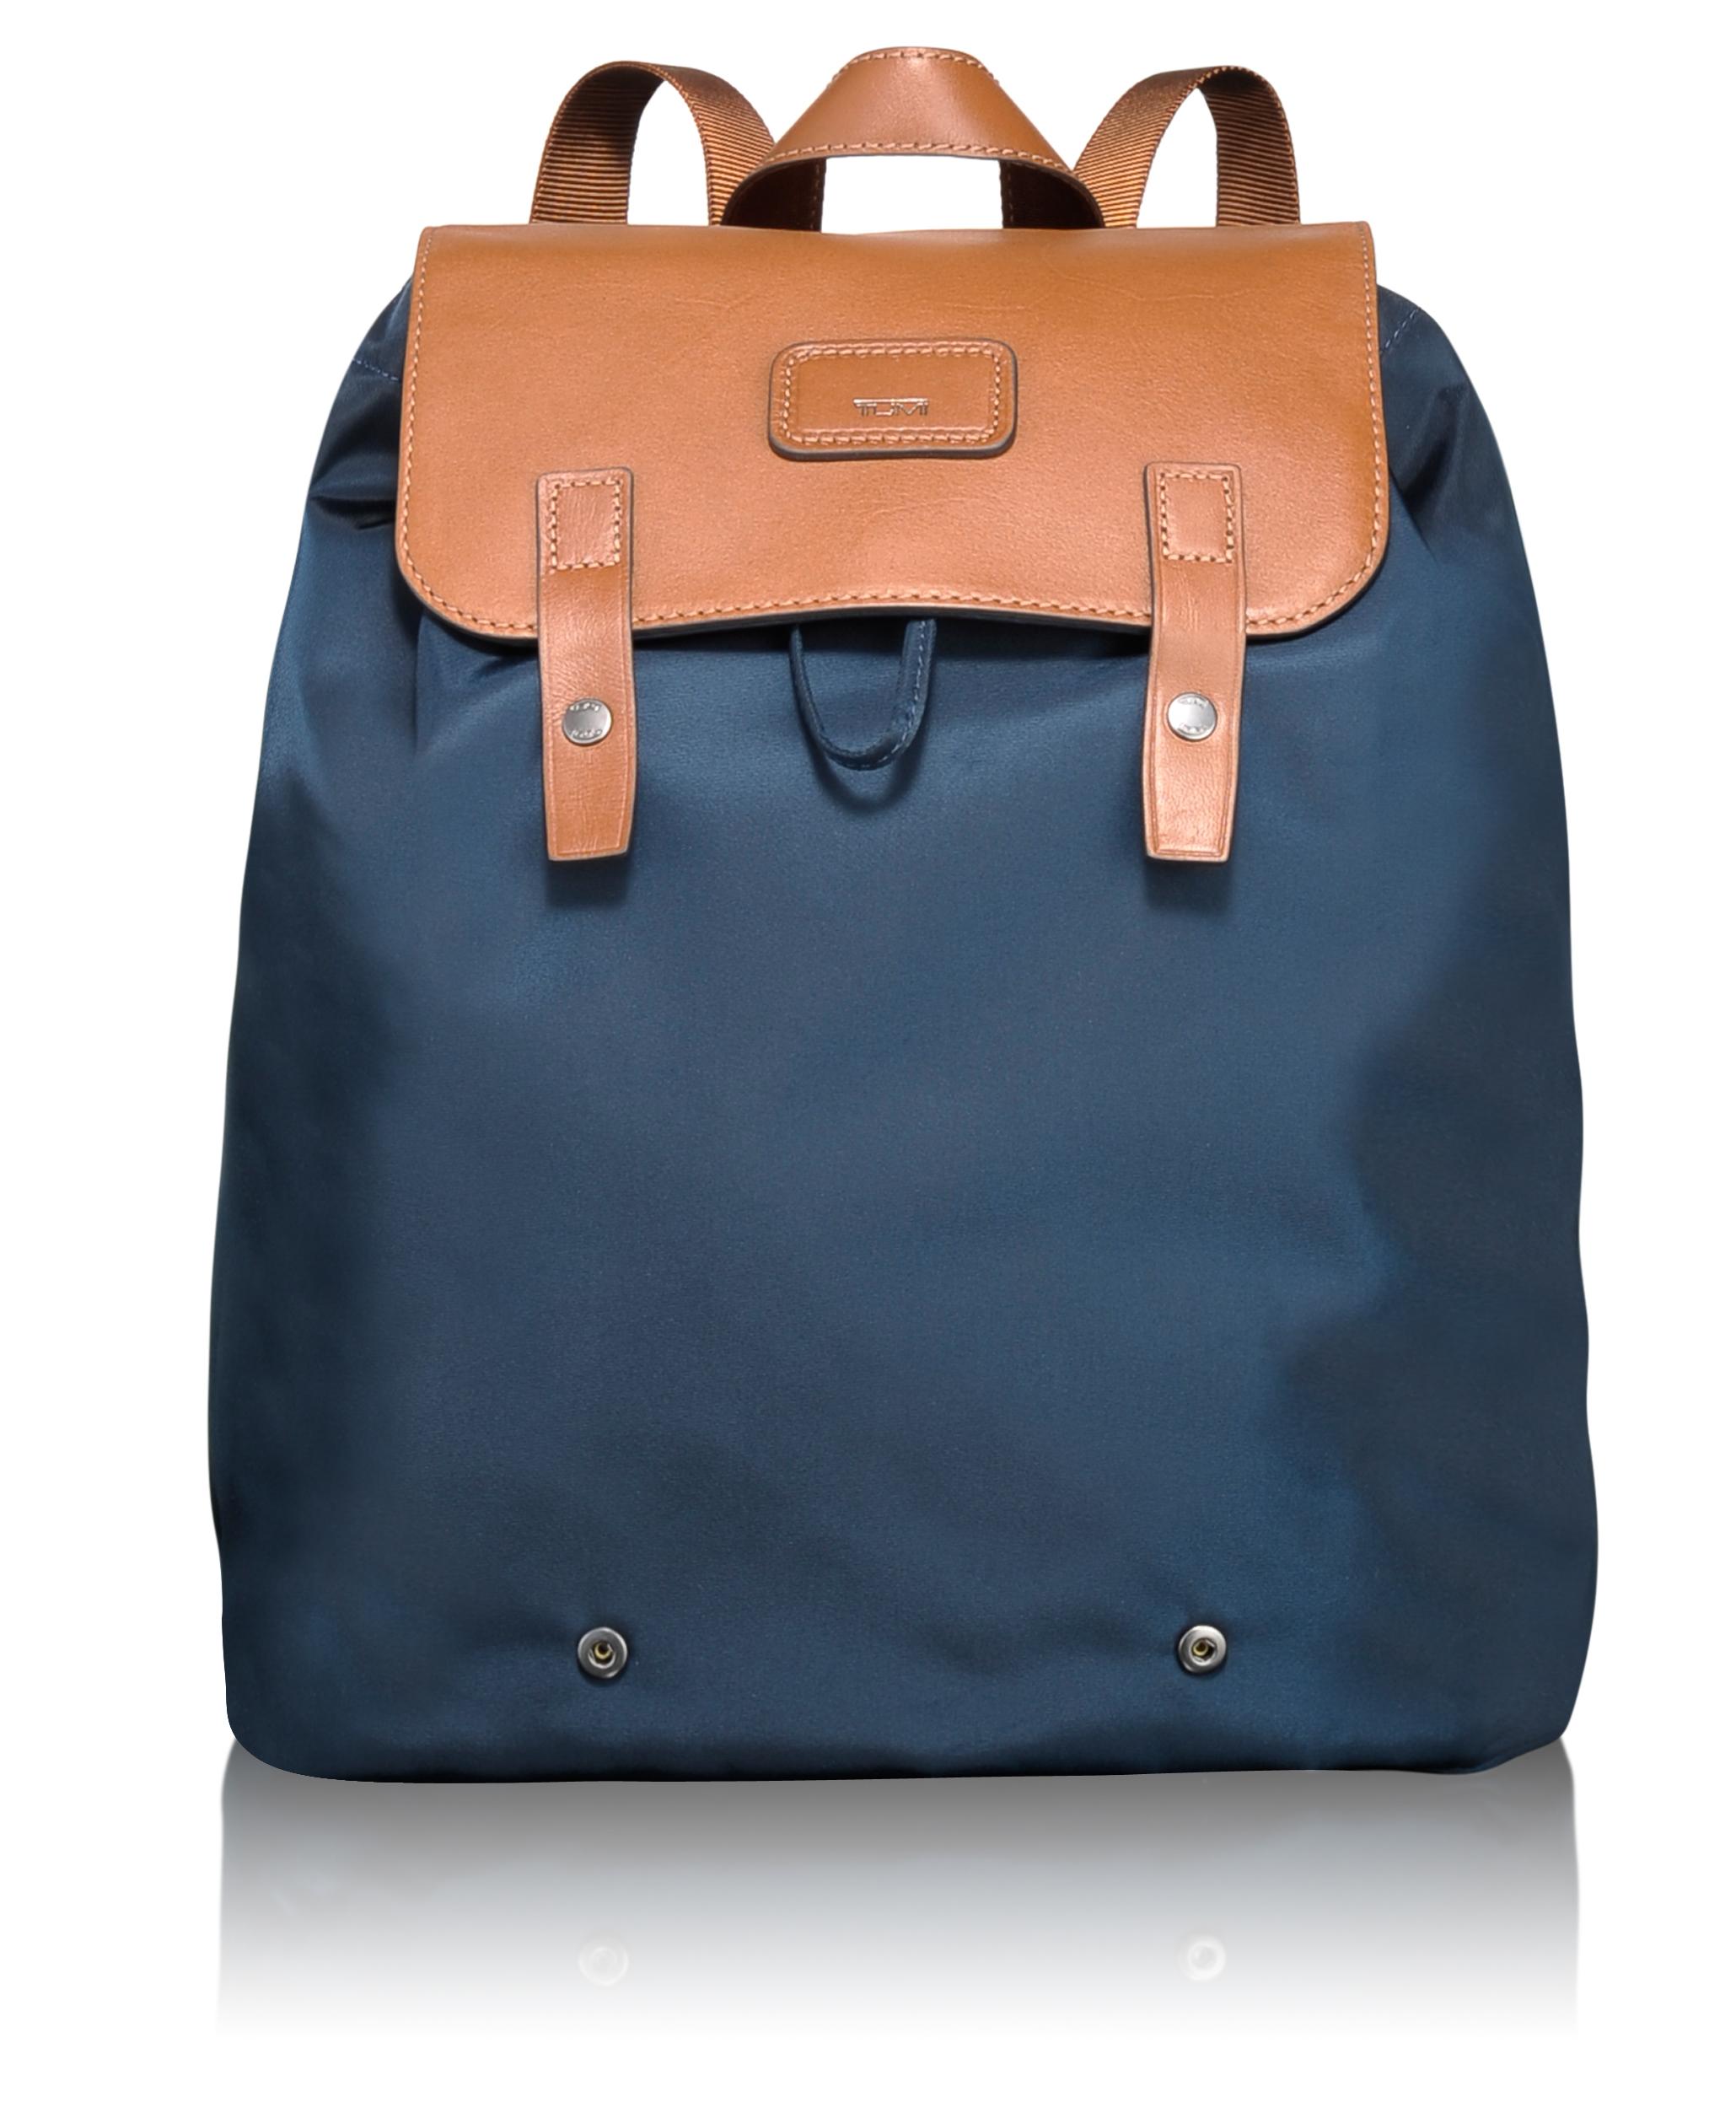 14842 Navy Pack A Way Backpack.jpg